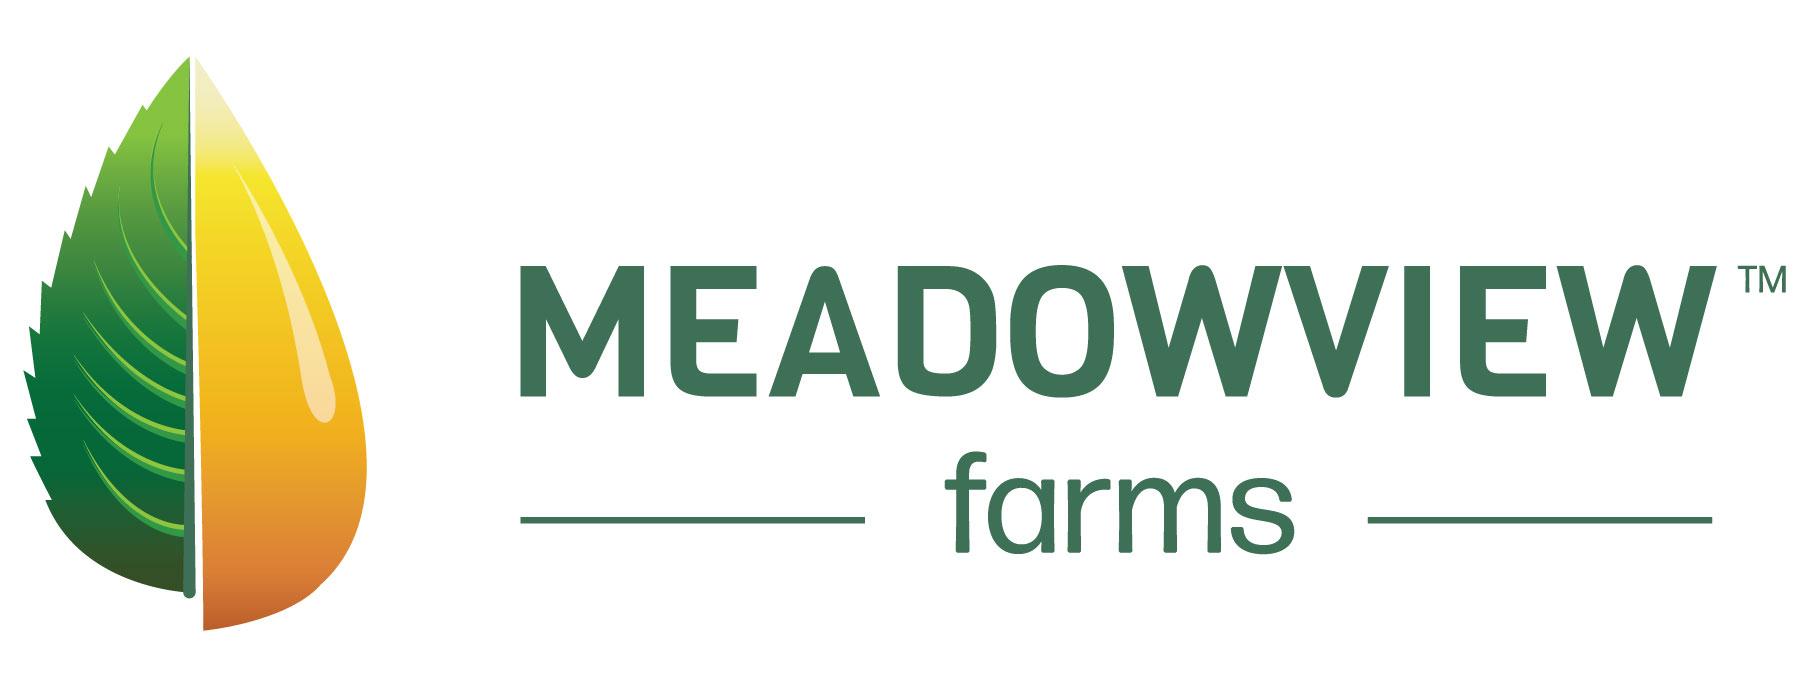 Meadowview Farms